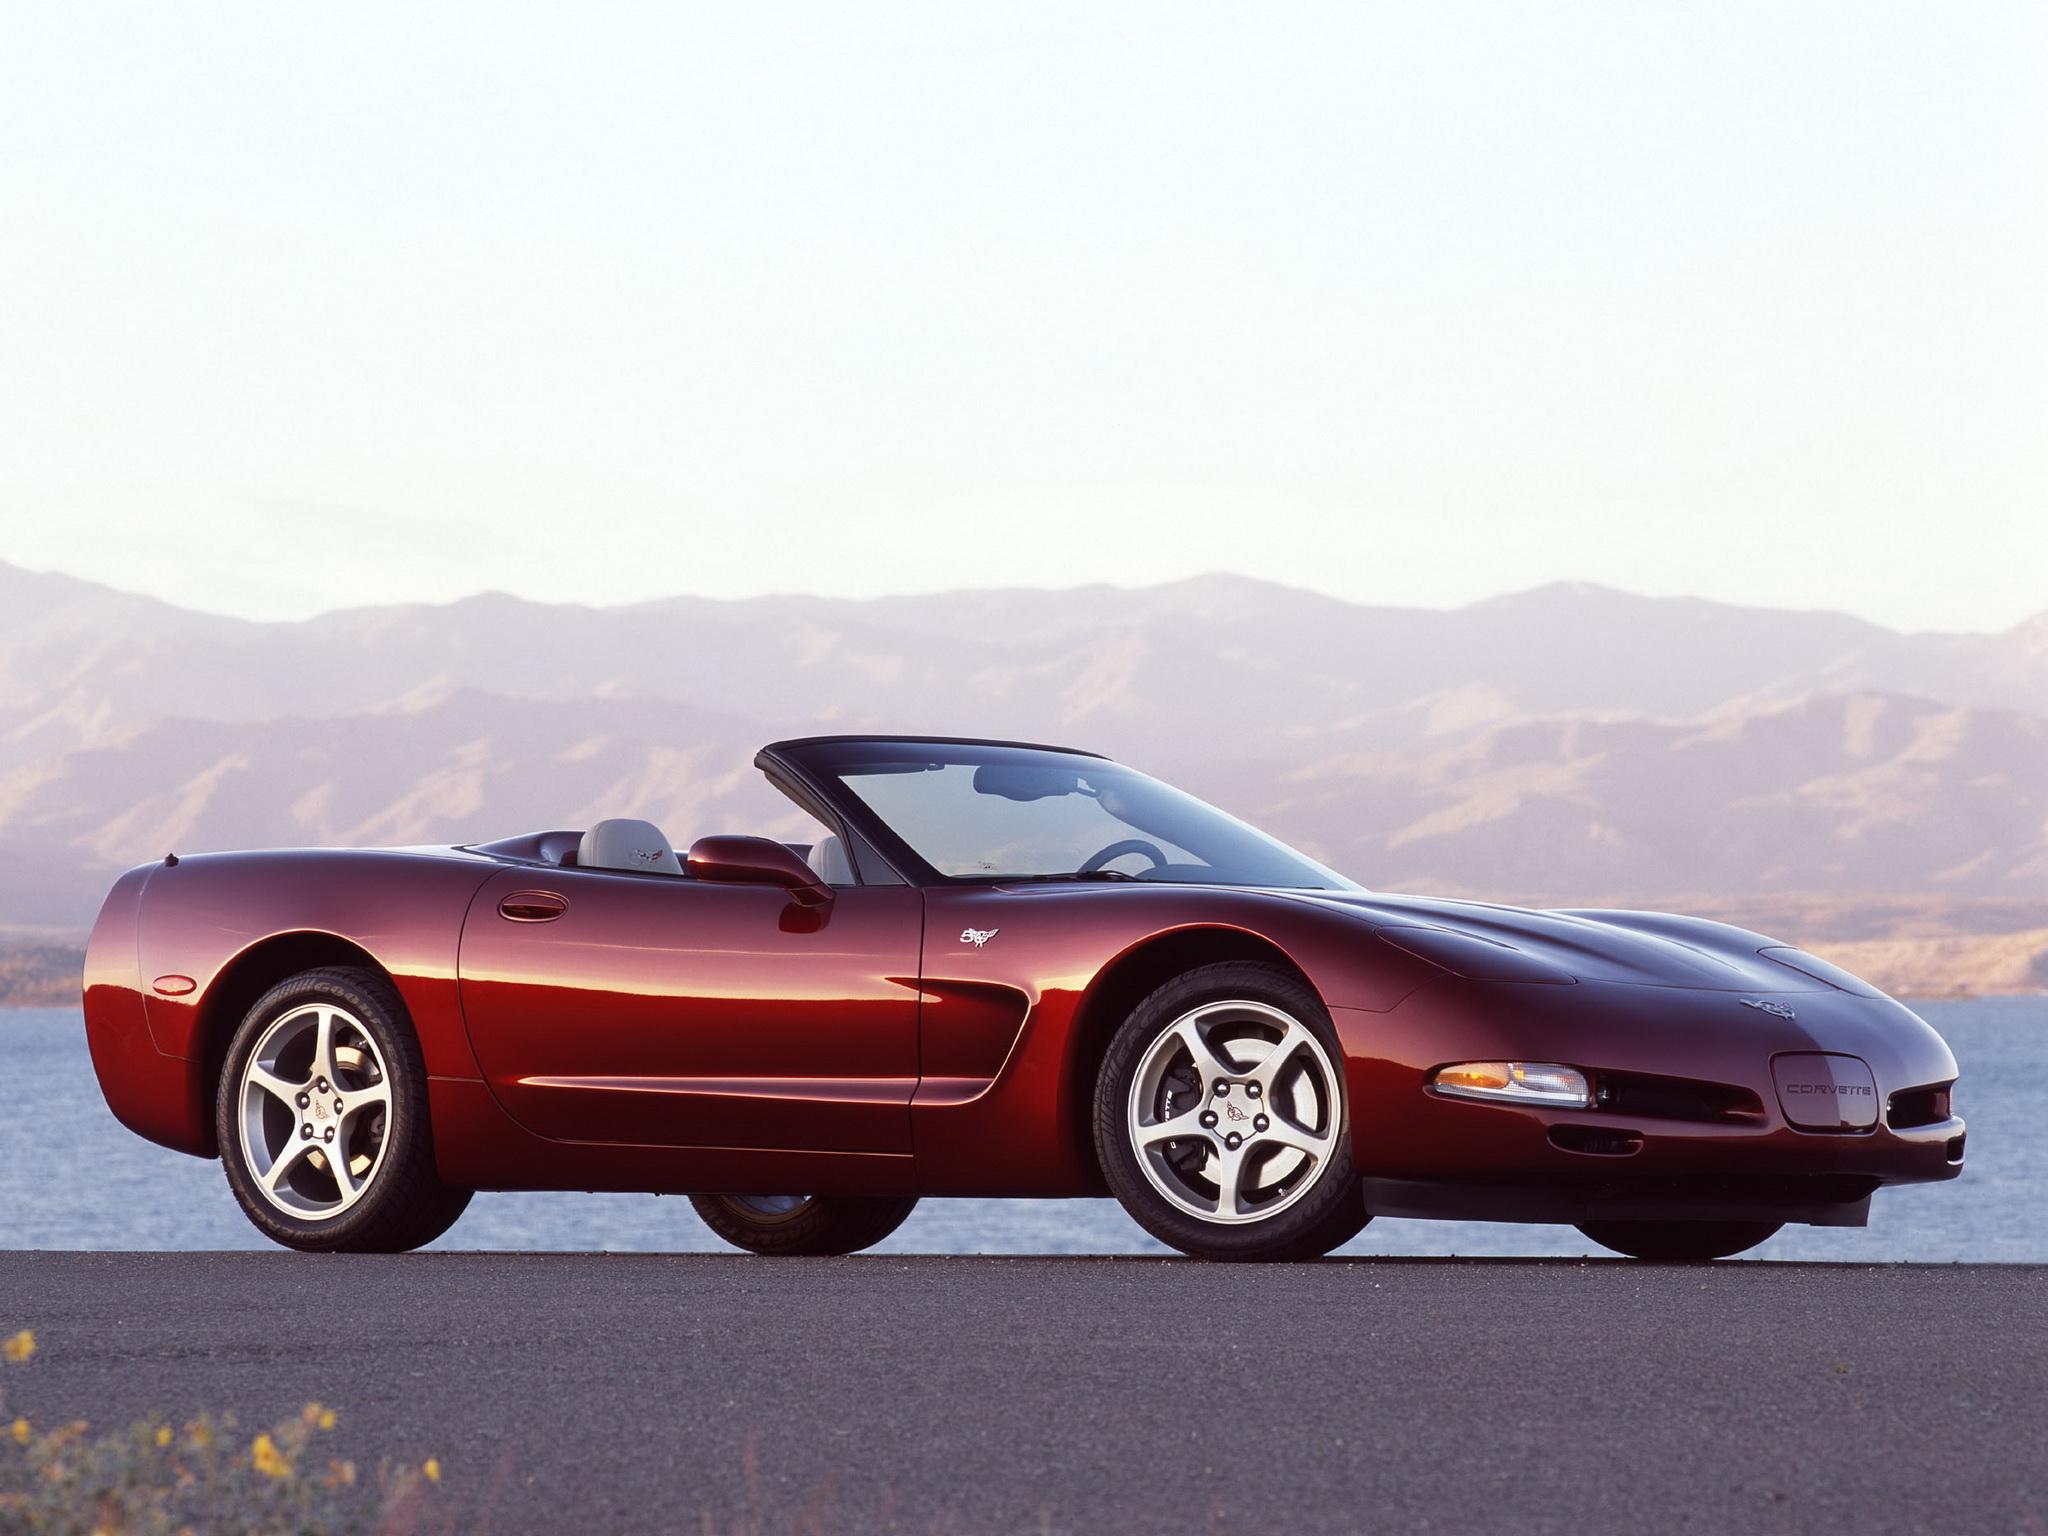 2002 chevrolet corvette convertible 50th anniversary c5 supercar muscle t wallpaper 2048x1536 180173 wallpaperup - Corvette C5 Logo Wallpaper